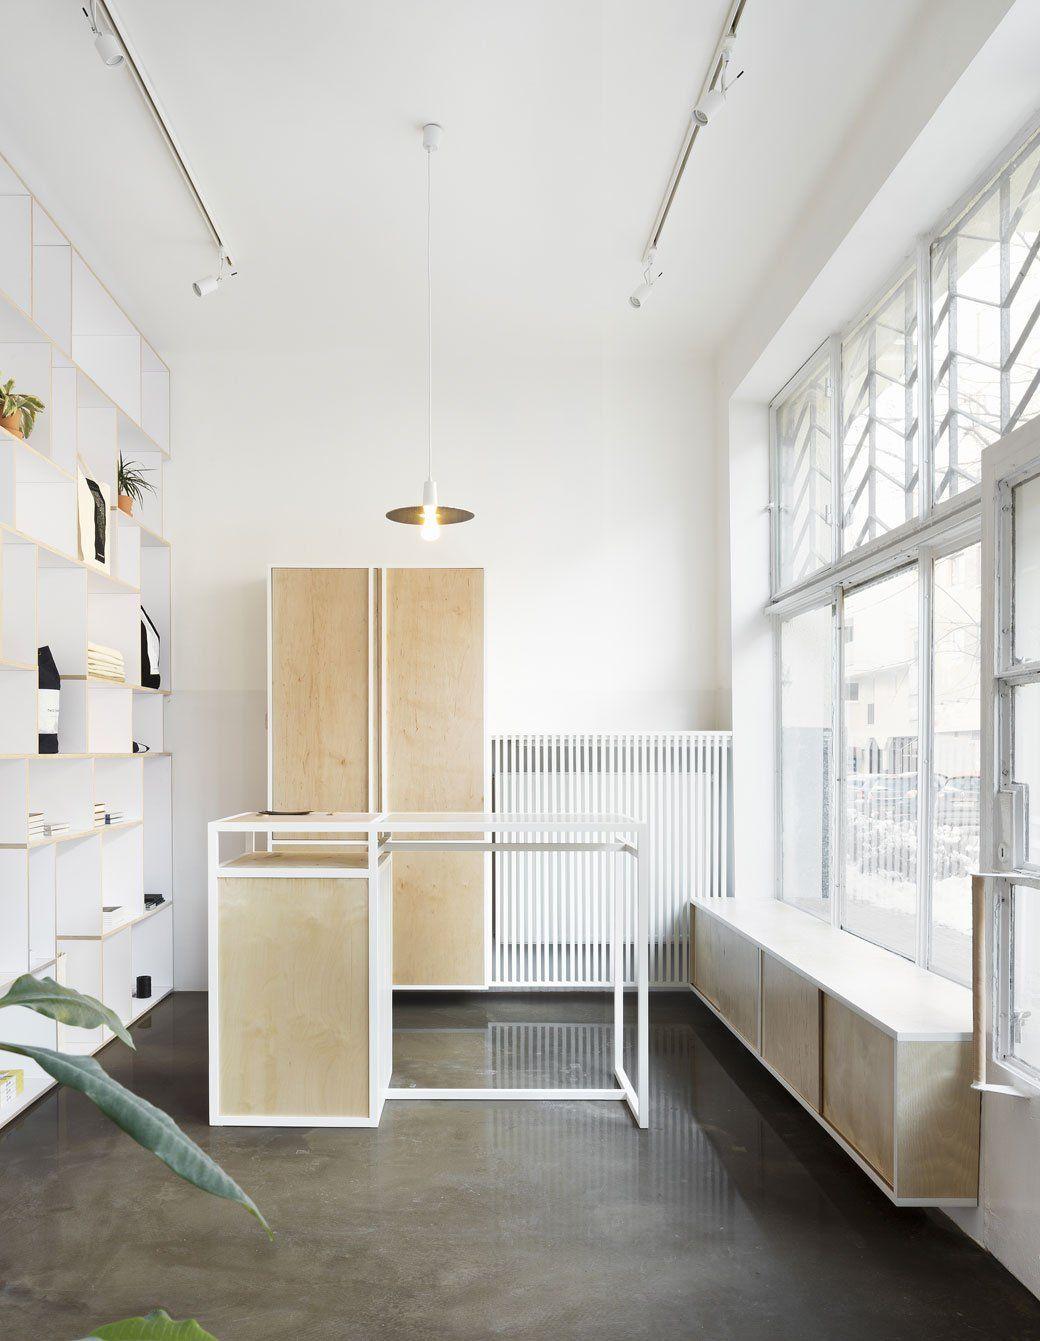 Kinfolk Style Shop In Warsaw  fddfcc942d280